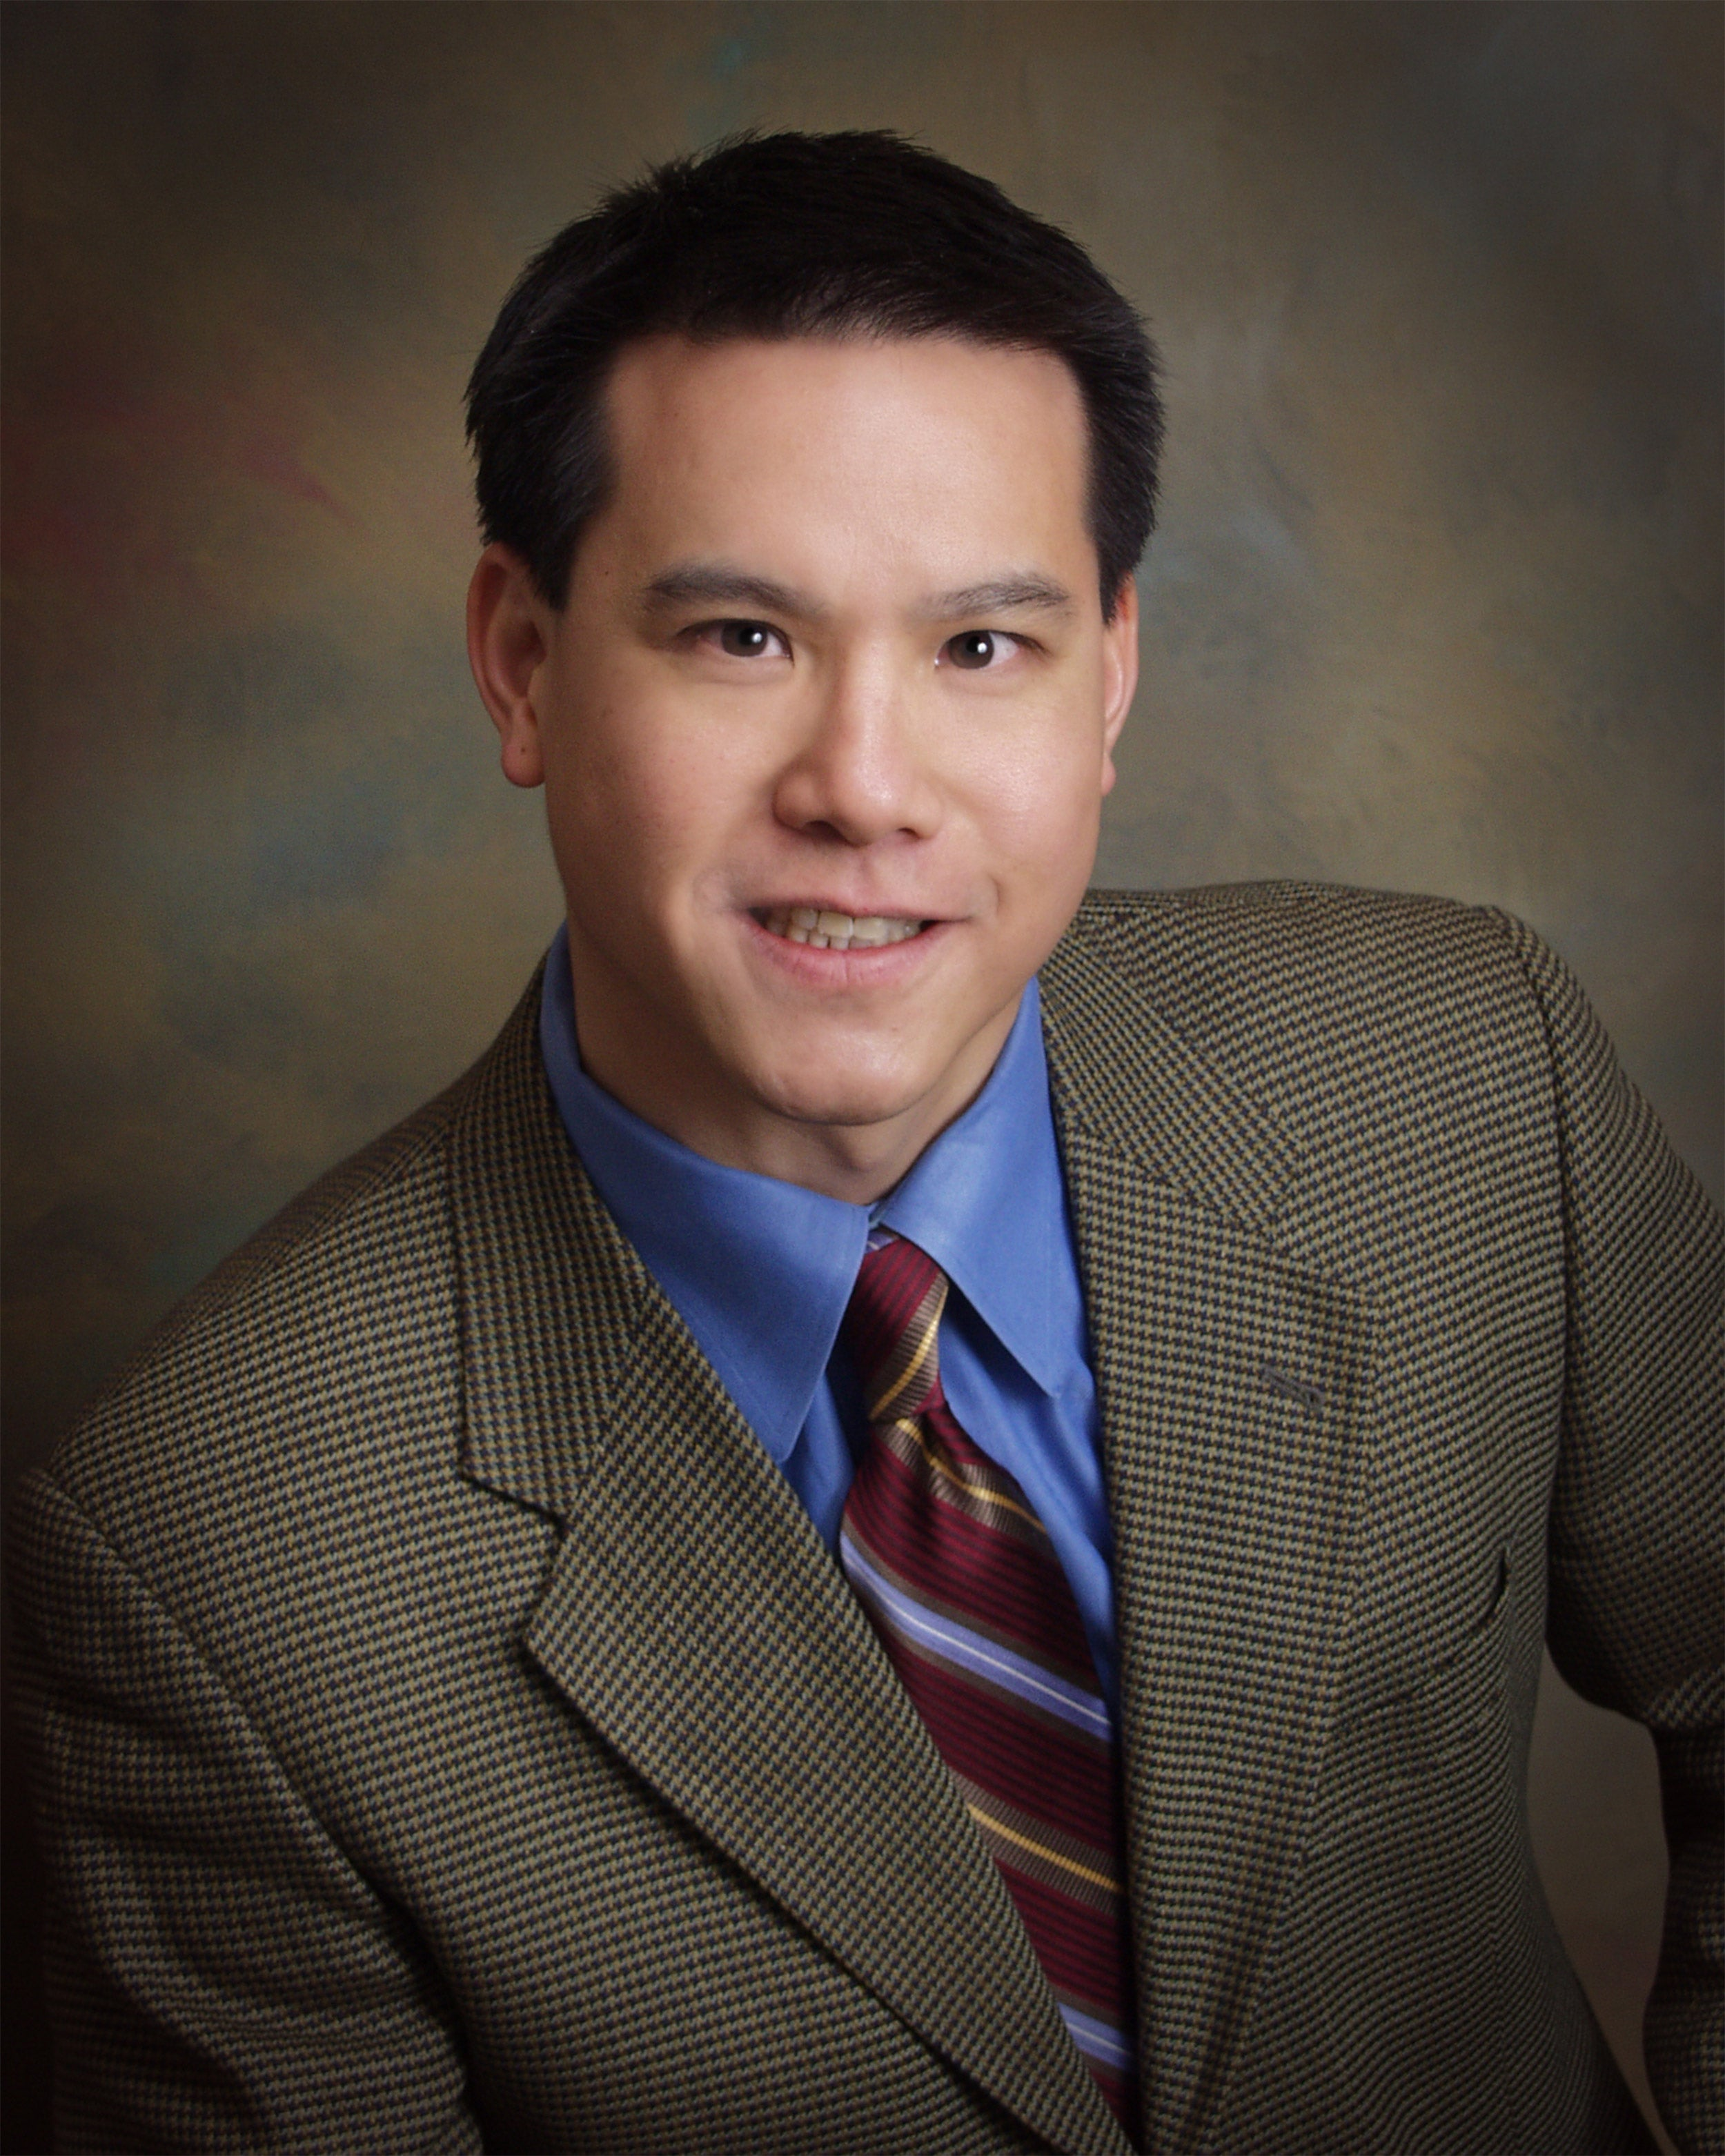 Douglas Chin '88, M.D. '93, M.M.Sc. '94